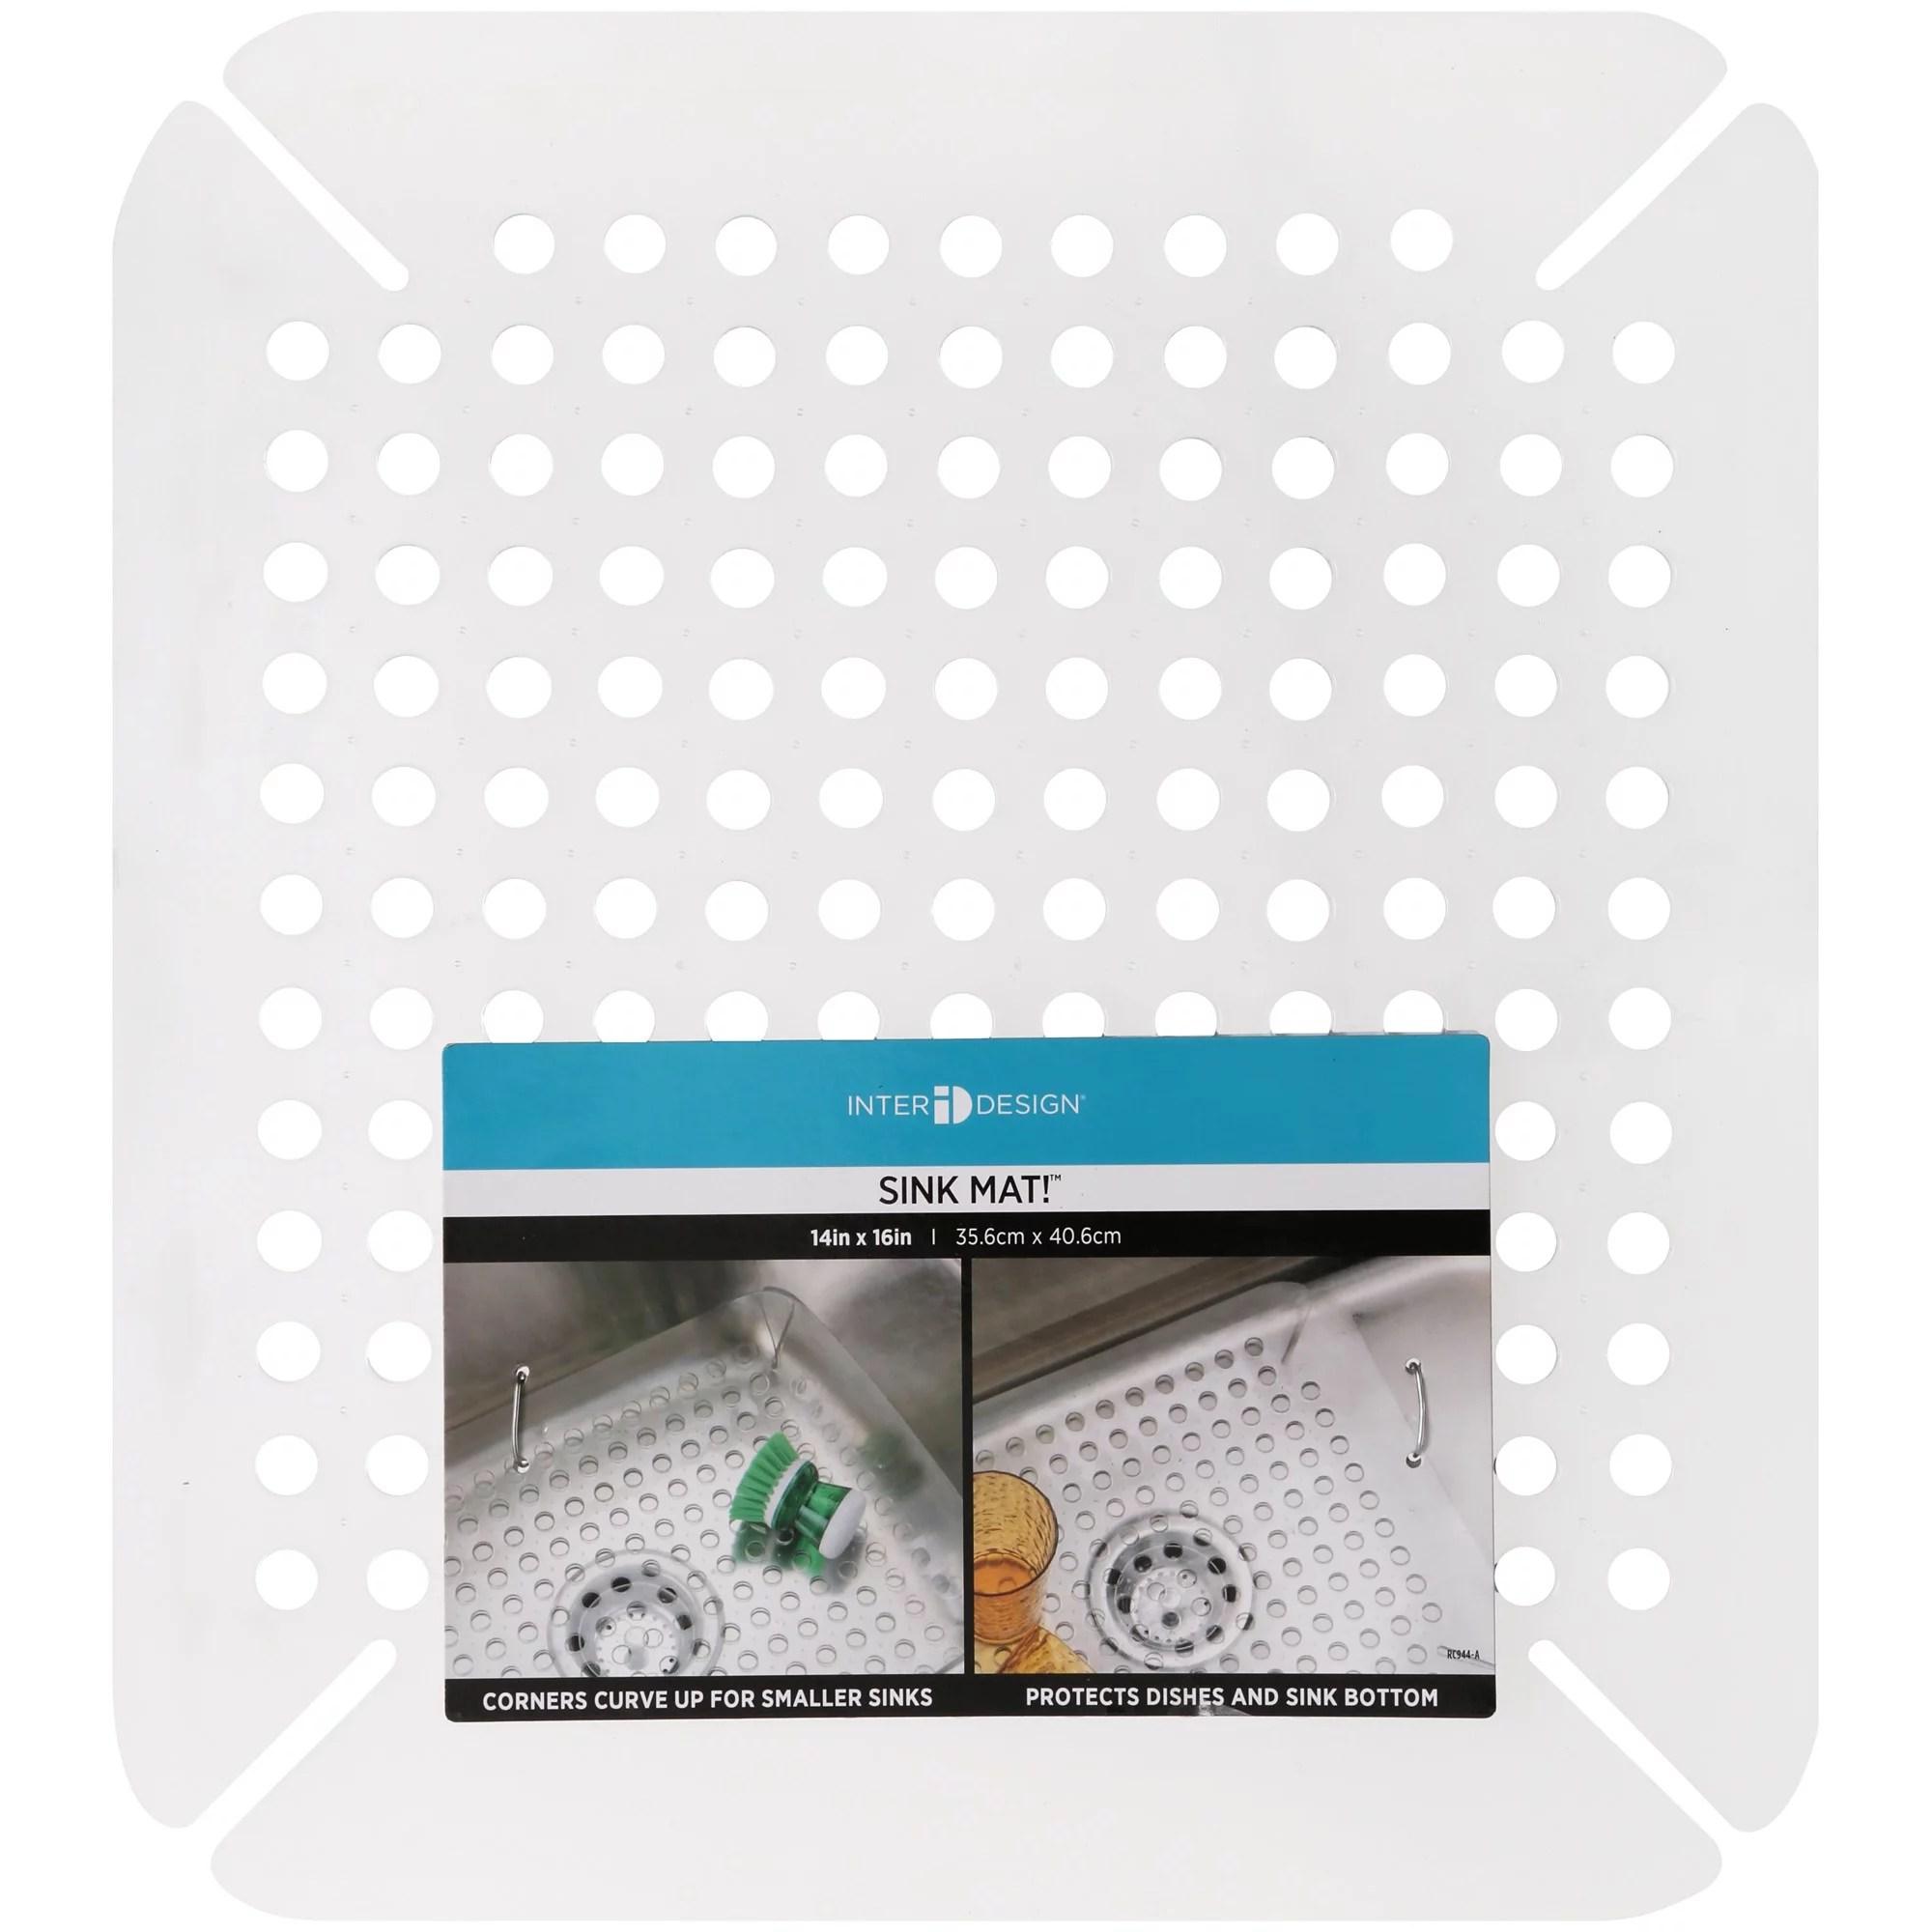 interdesign 14 x 16 adjustable sink mat clear